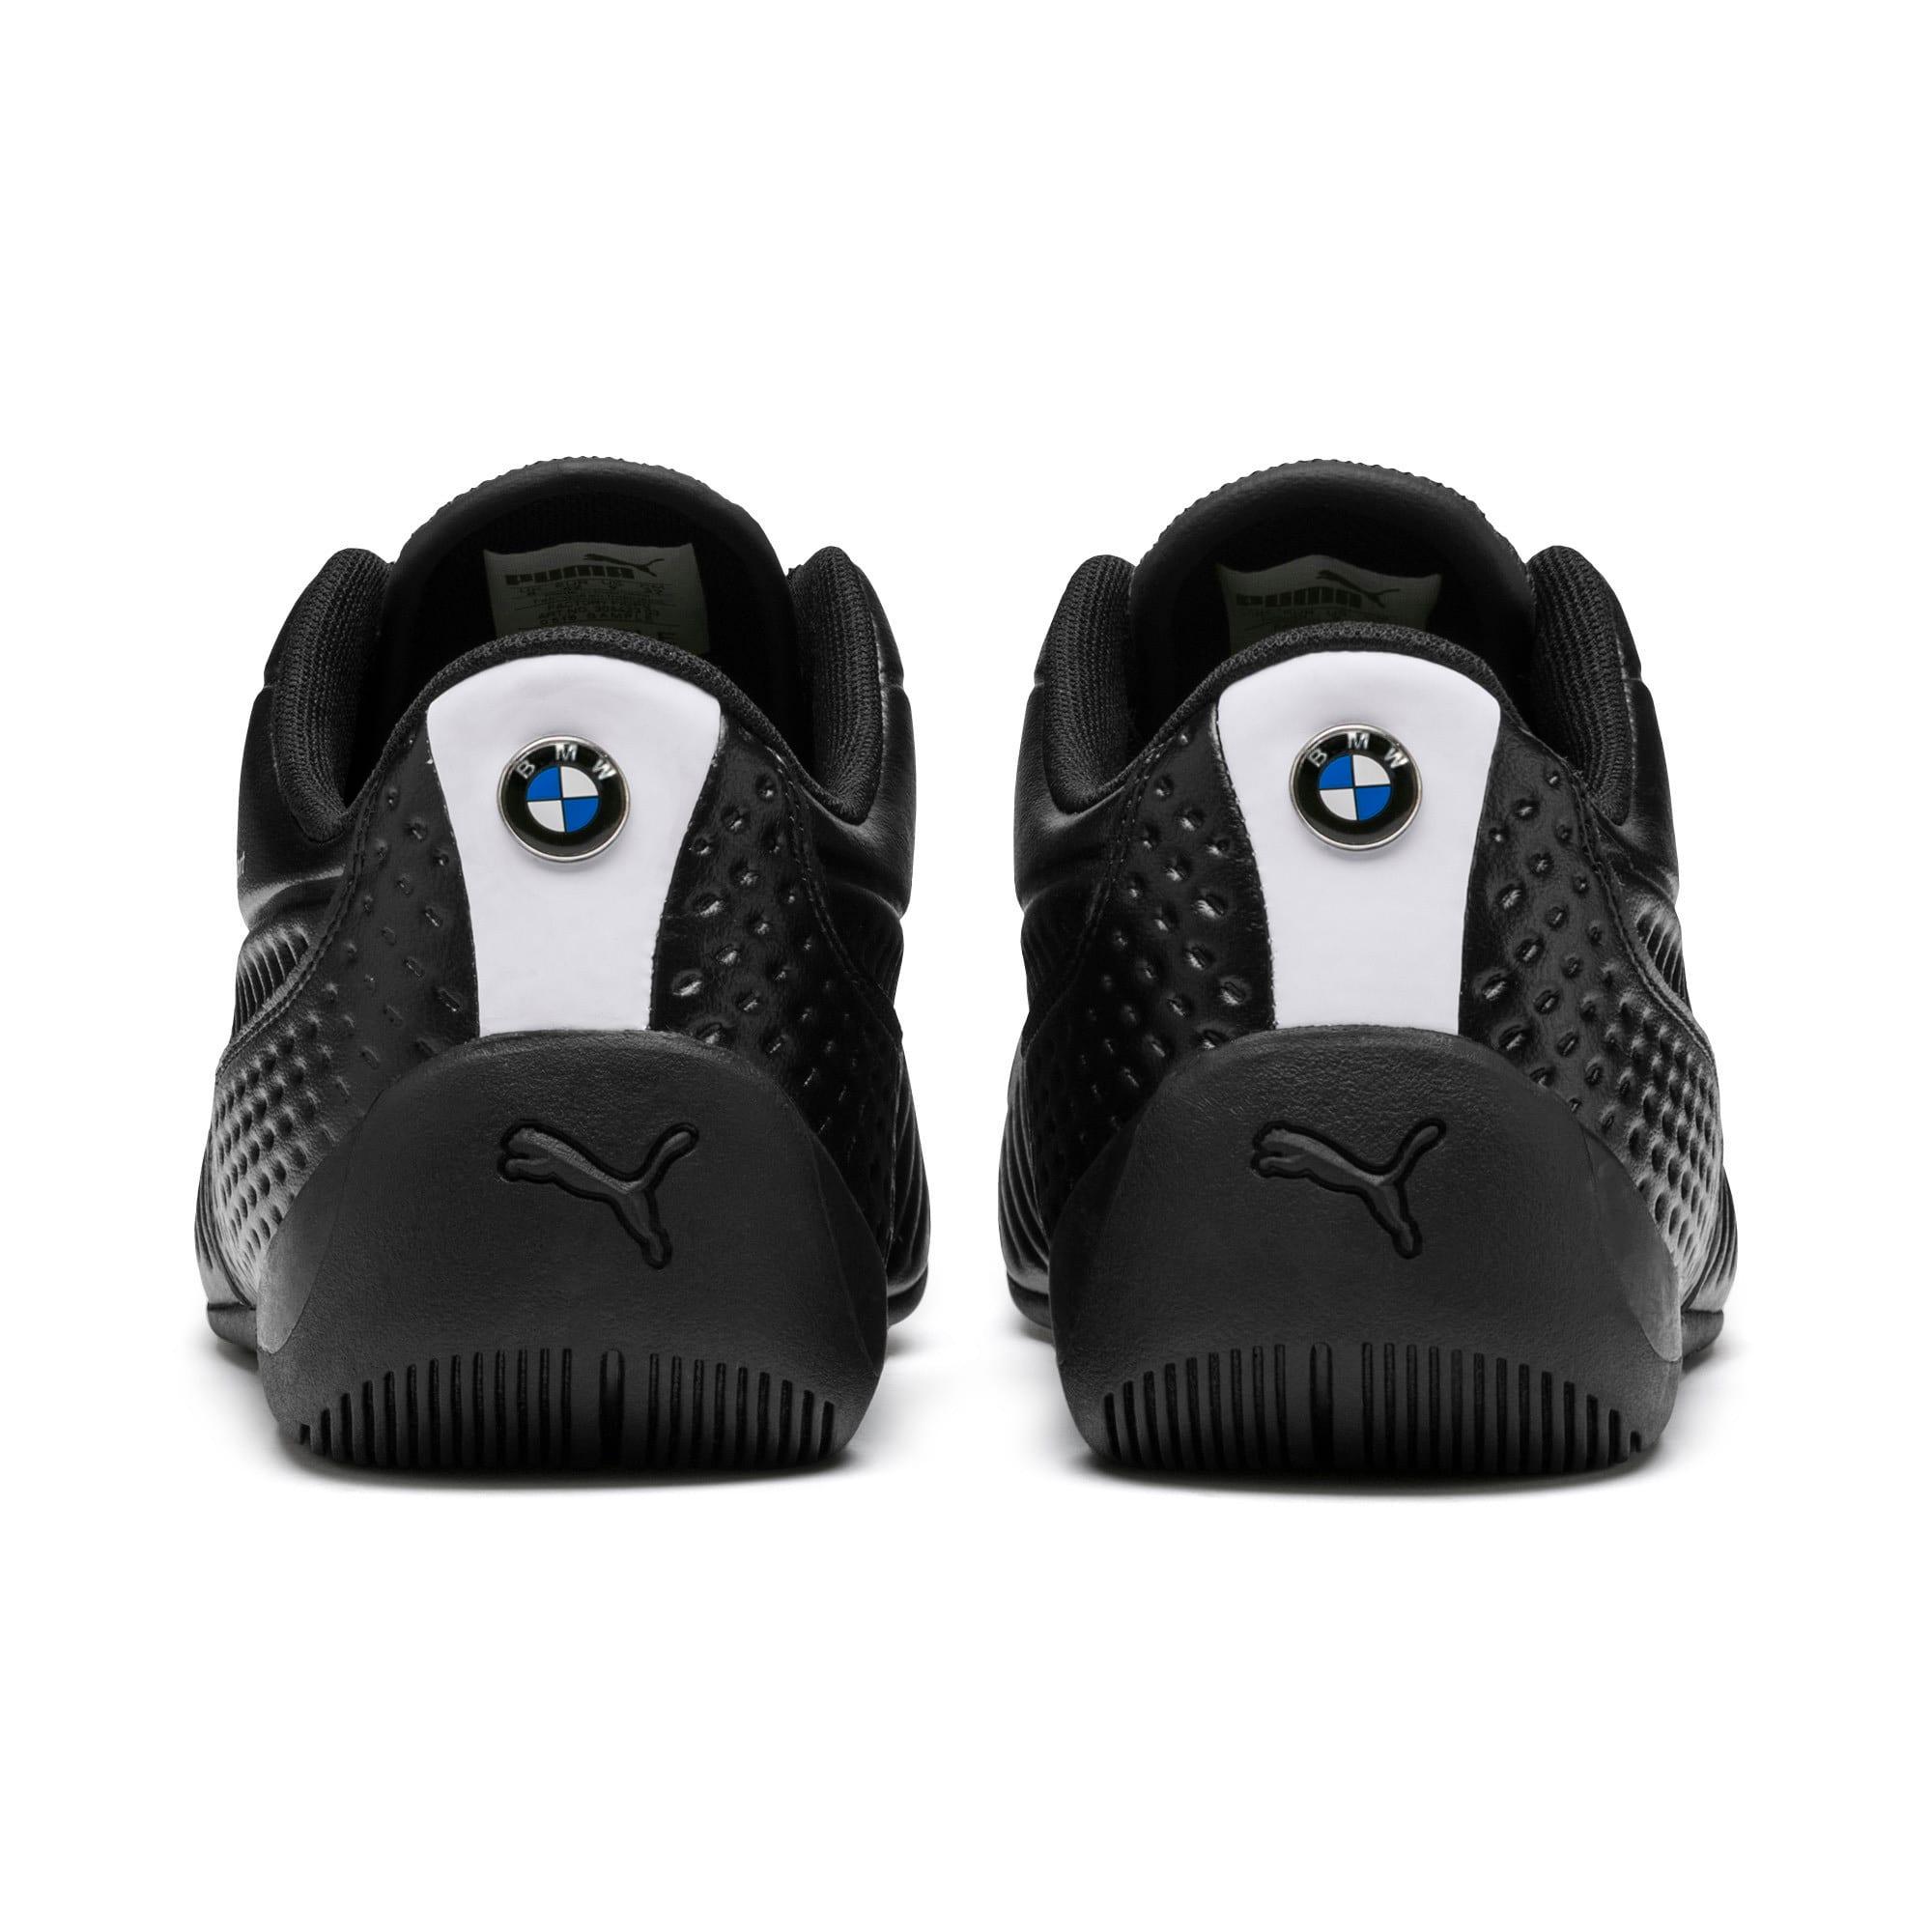 Thumbnail 5 of BMW M Drift Cat 7S Ultra Trainers, Puma Black-Puma White, medium-IND